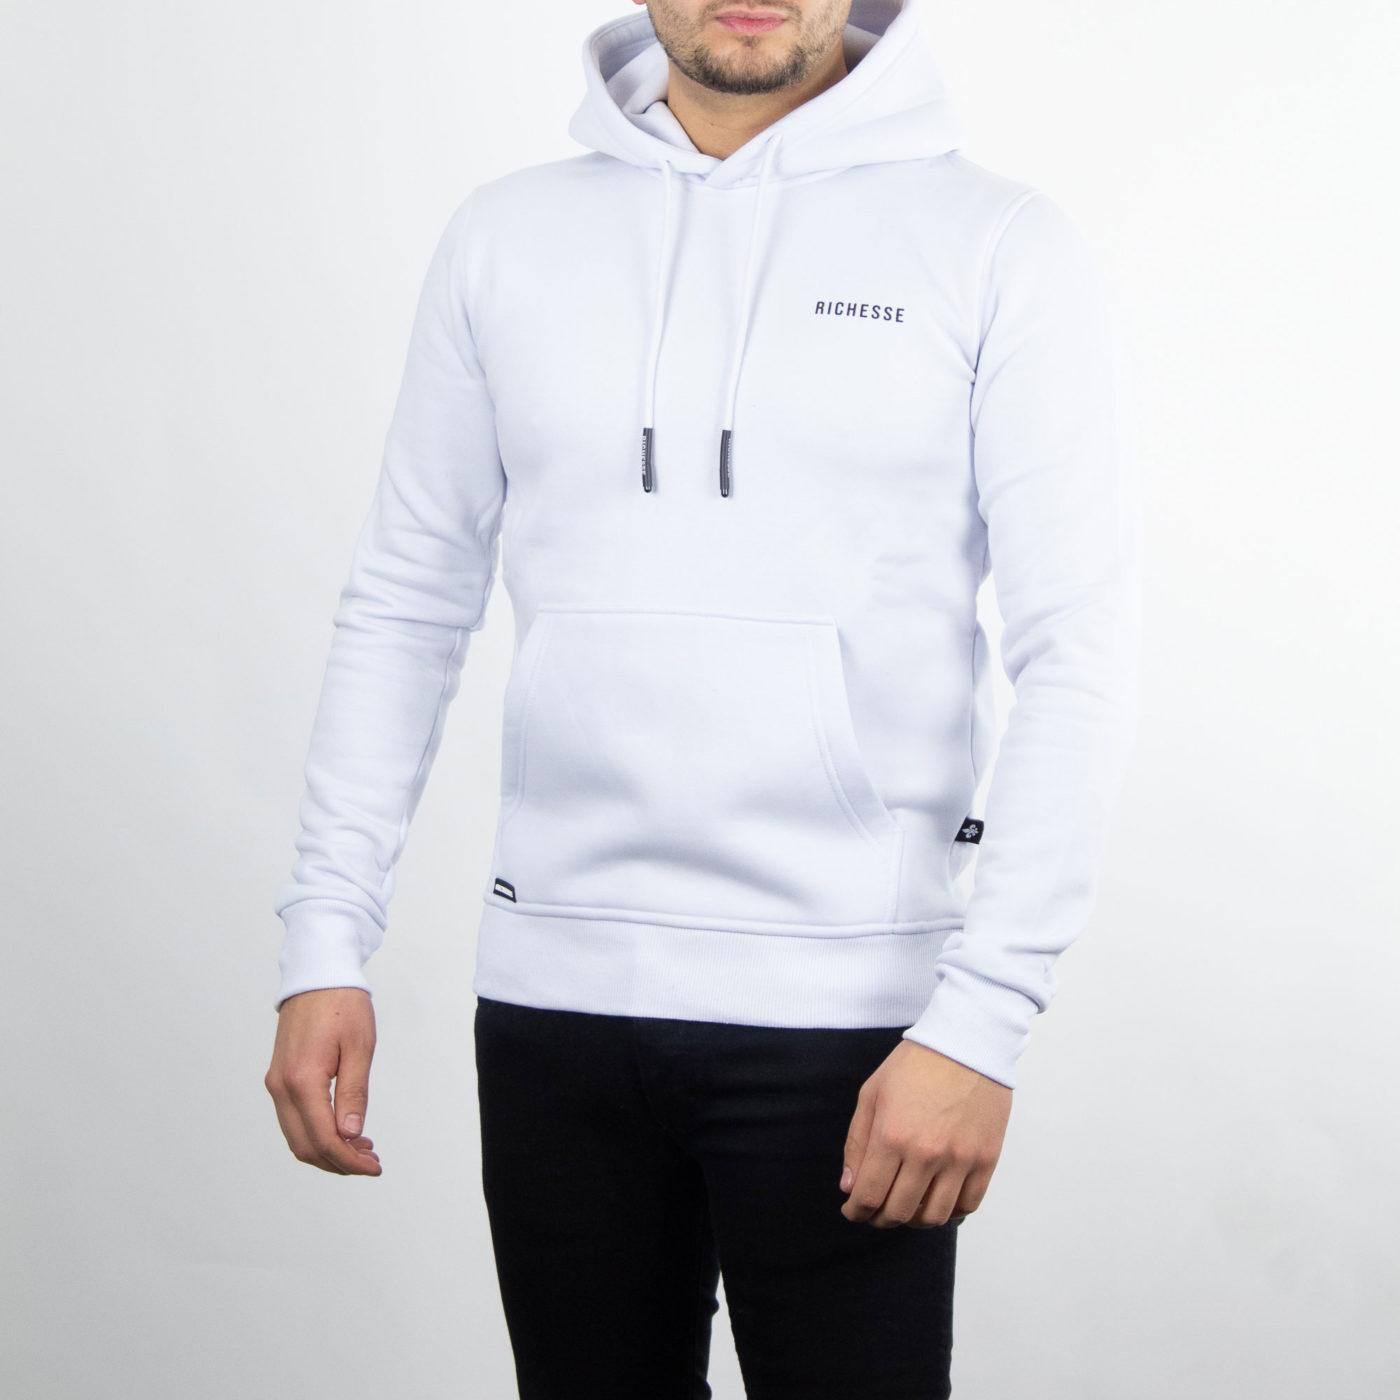 Richesse-Brand-Back-White-1